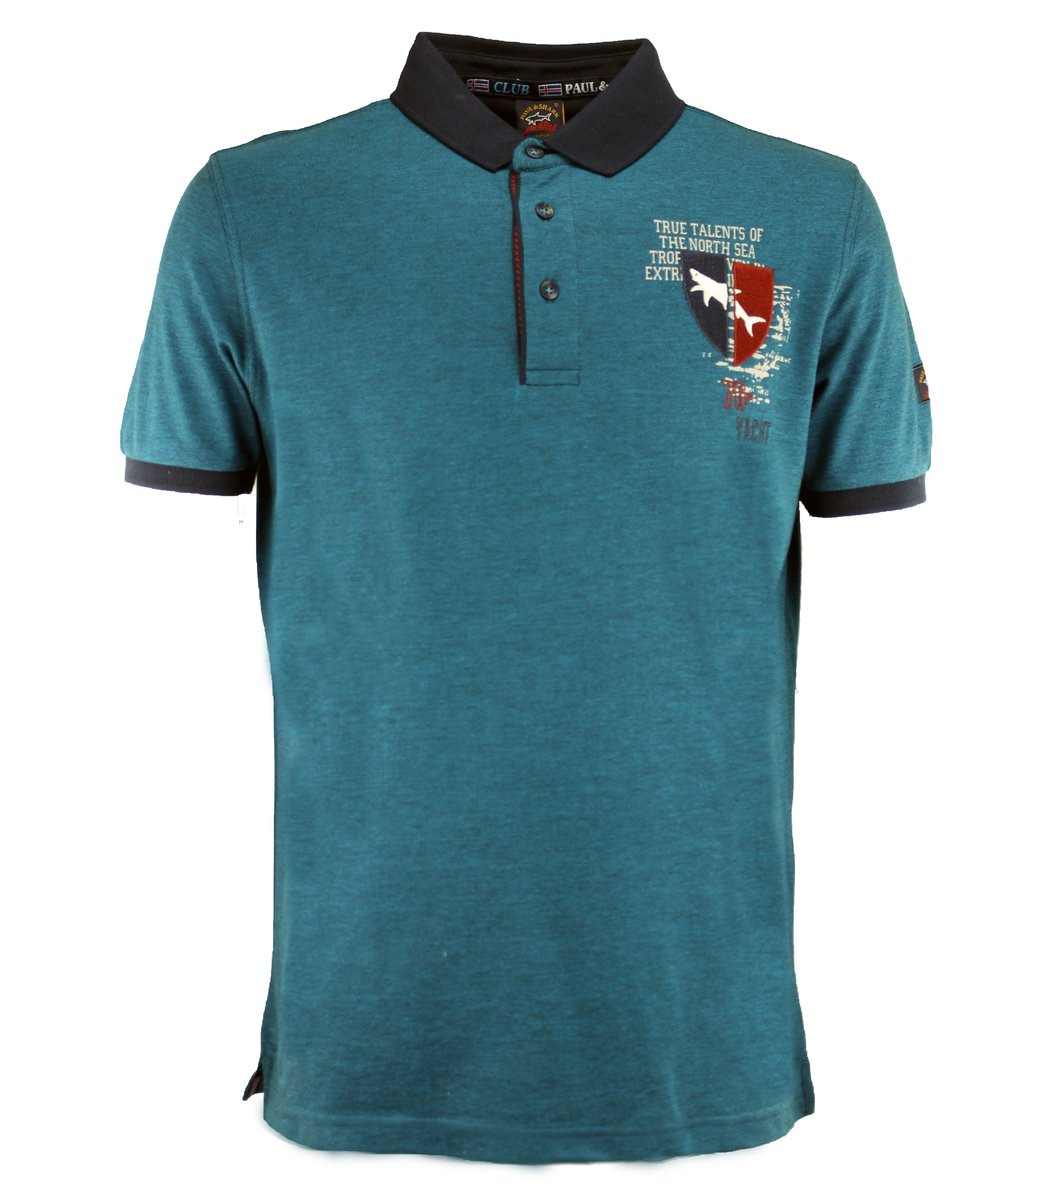 Голубая футболка поло Paul&Shark TP4